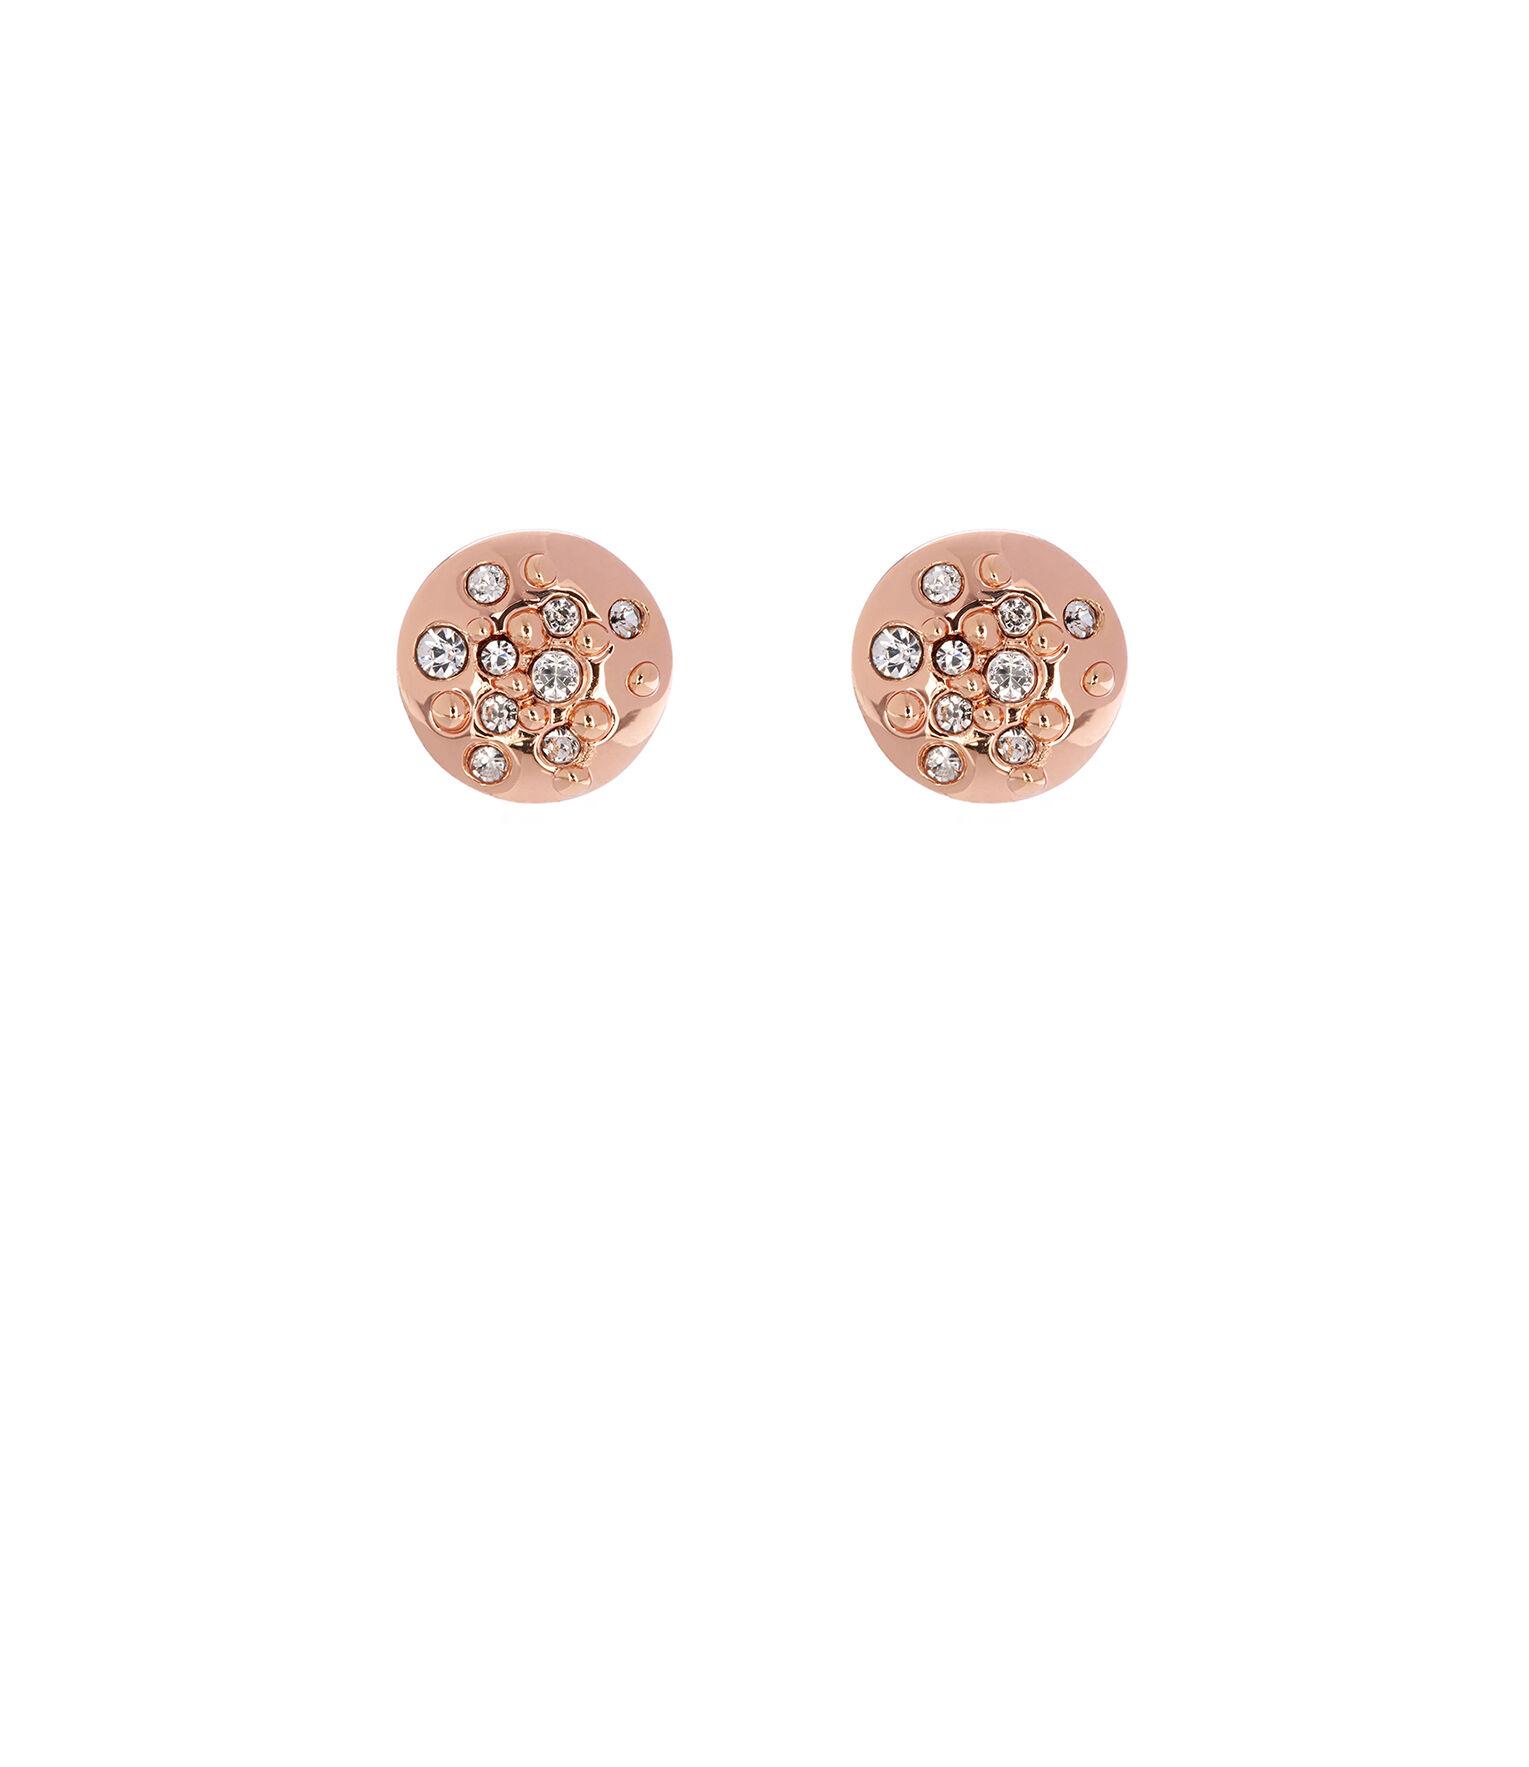 Karen Millen, Crystal Sprinkle Stud Earrings Rose Gold Colour 0